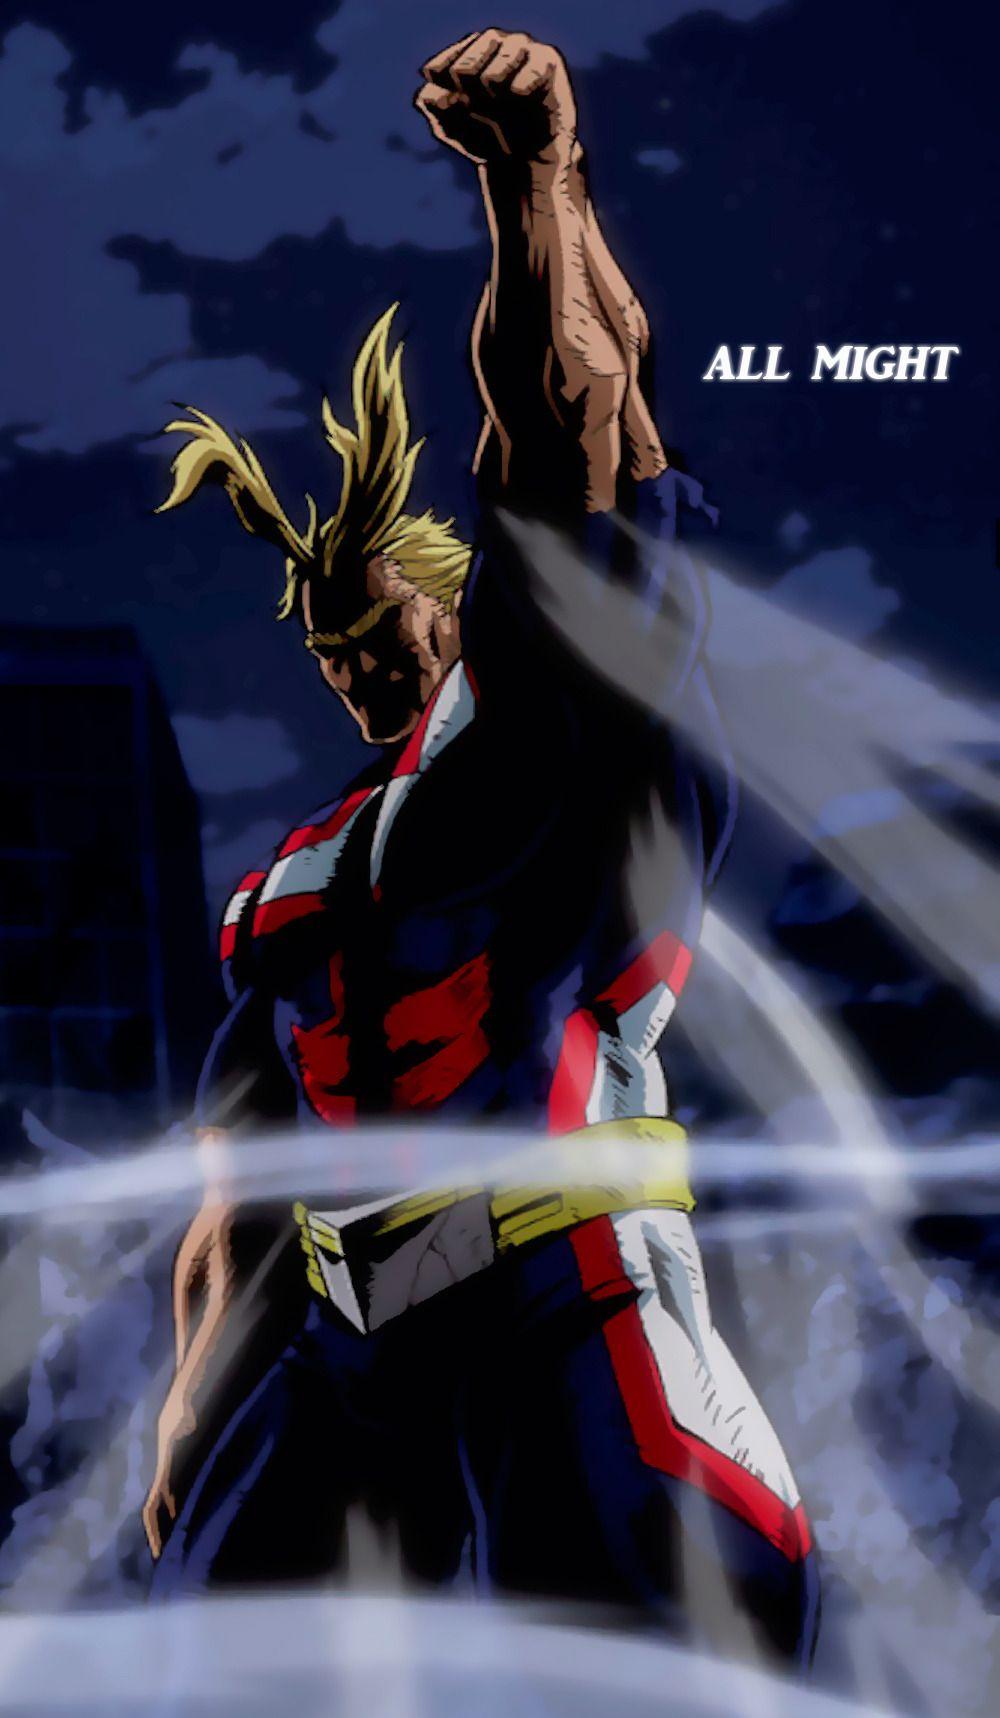 All Might   Wallpaper   Personajes de anime, Personajes de ...